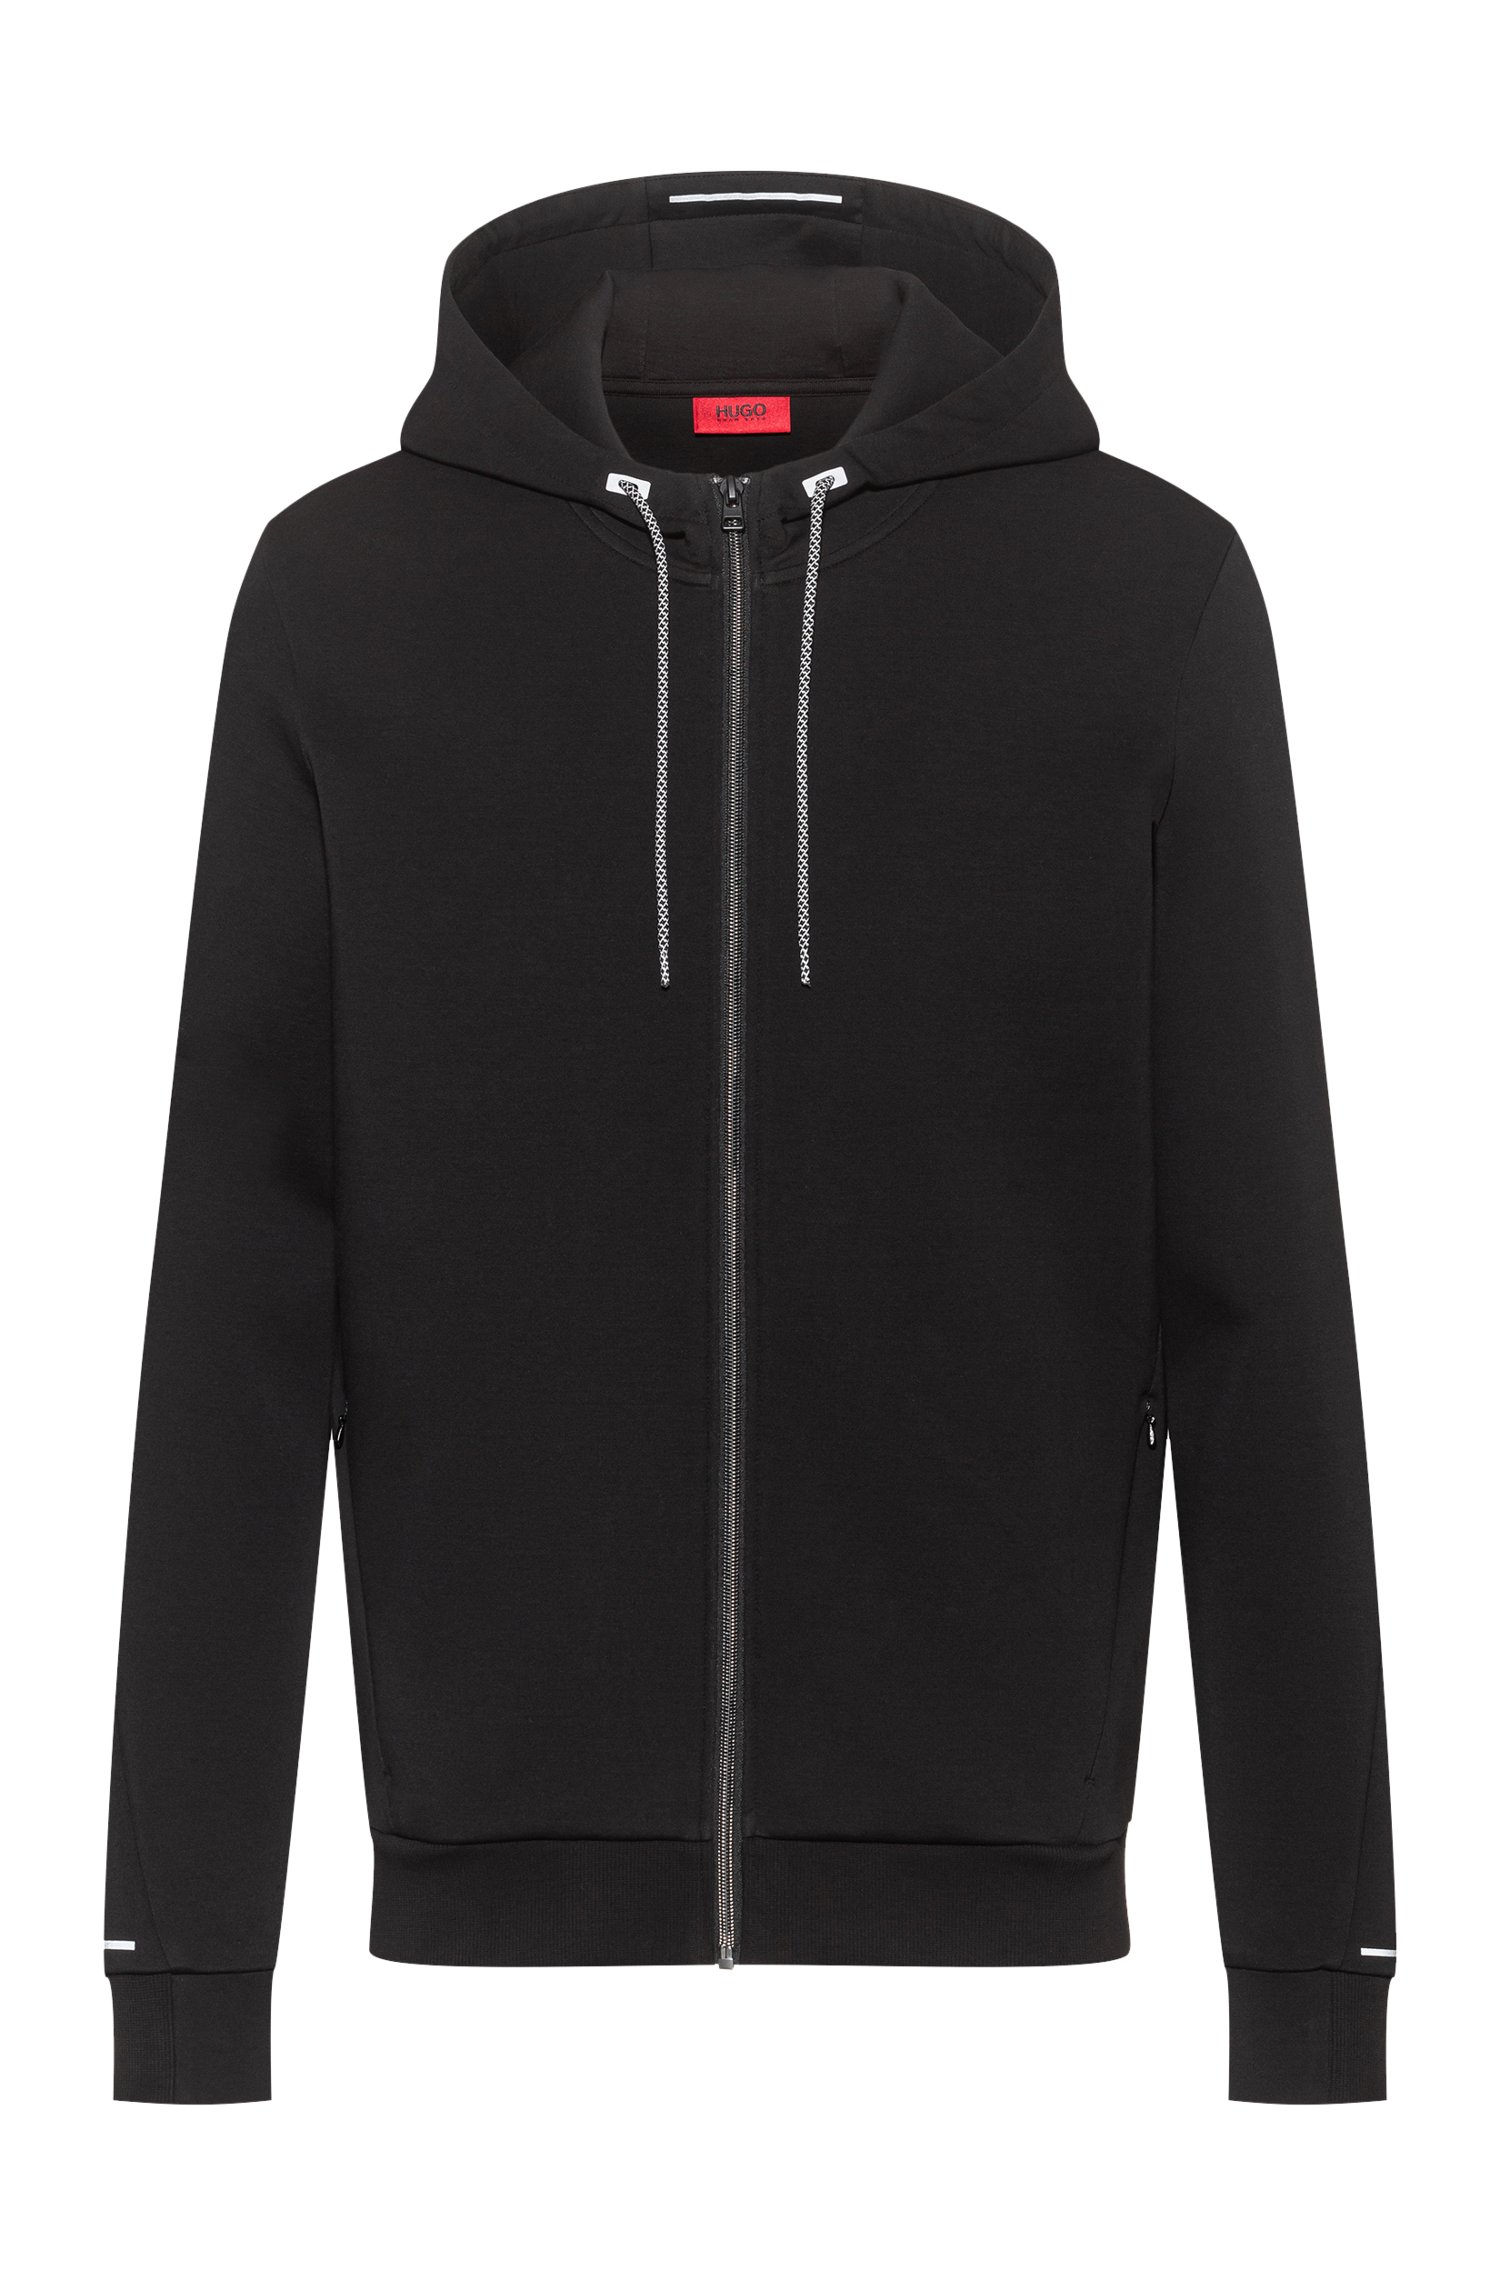 Cotton-blend zip-through hoodie with reflective trims, Black